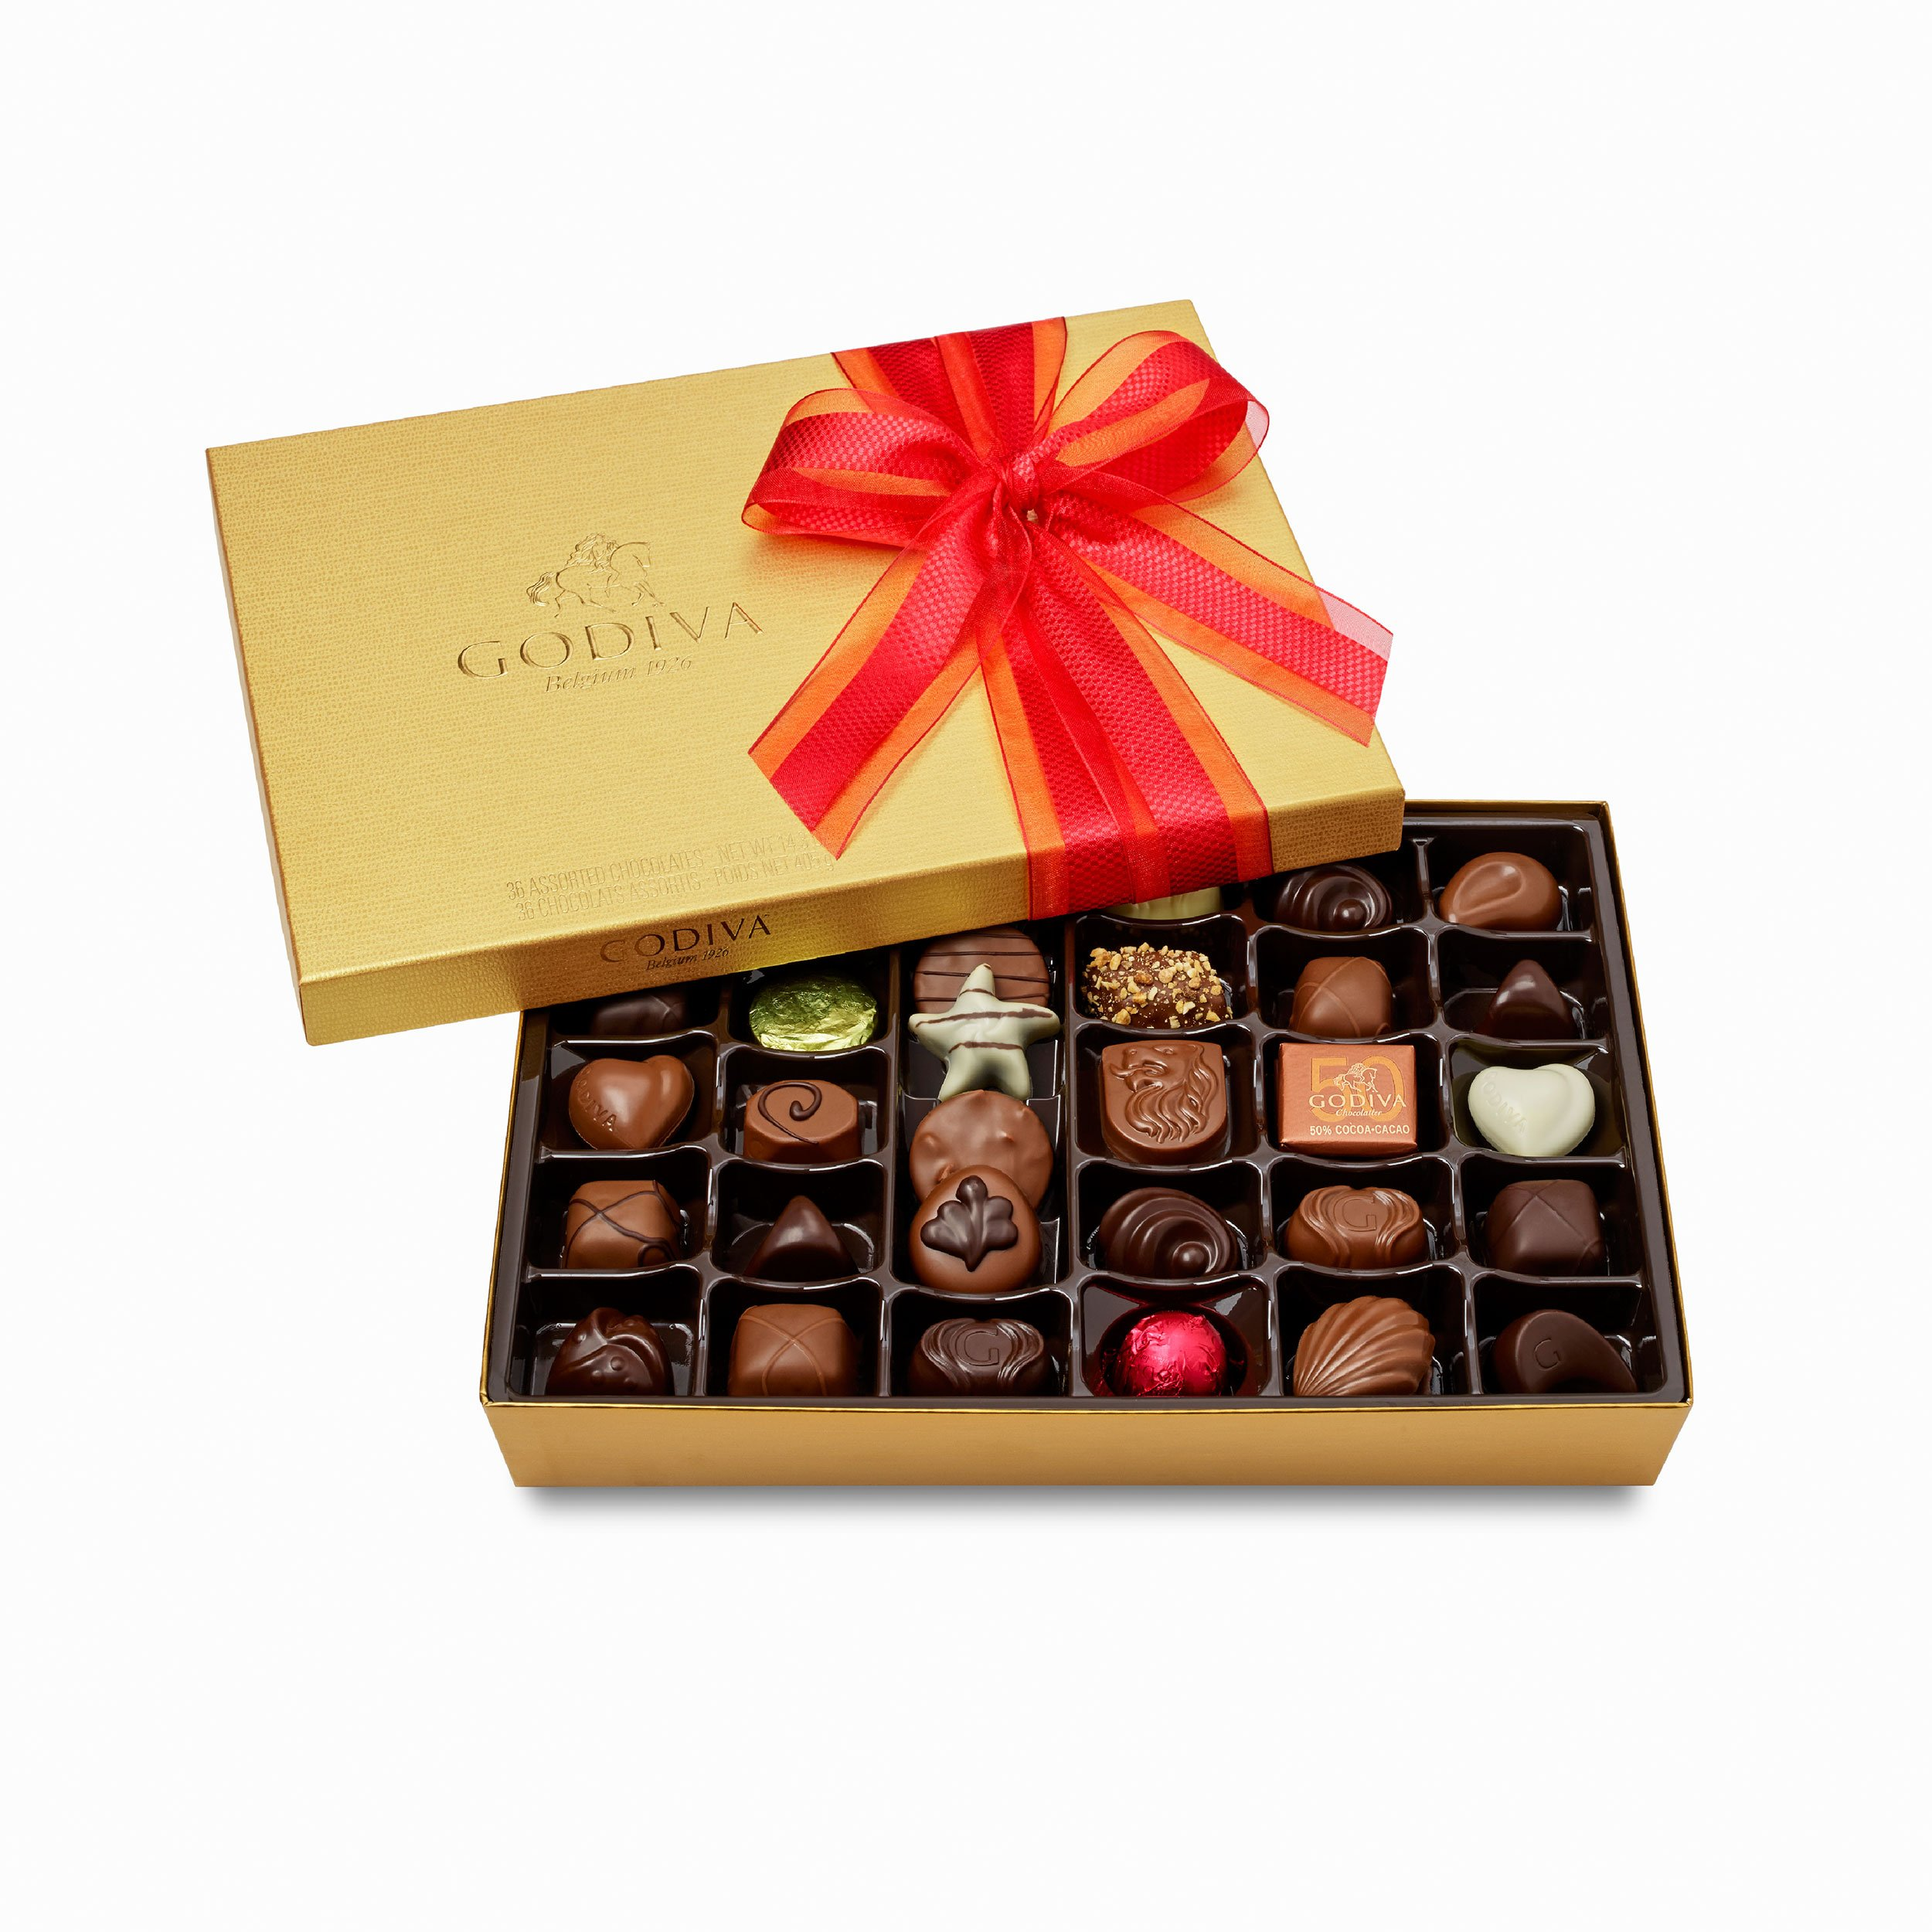 Godiva Chocolatier Gold Ballotin Assorted Gourmet Chocolates 36 Piece Gift Box, Great for Gifting